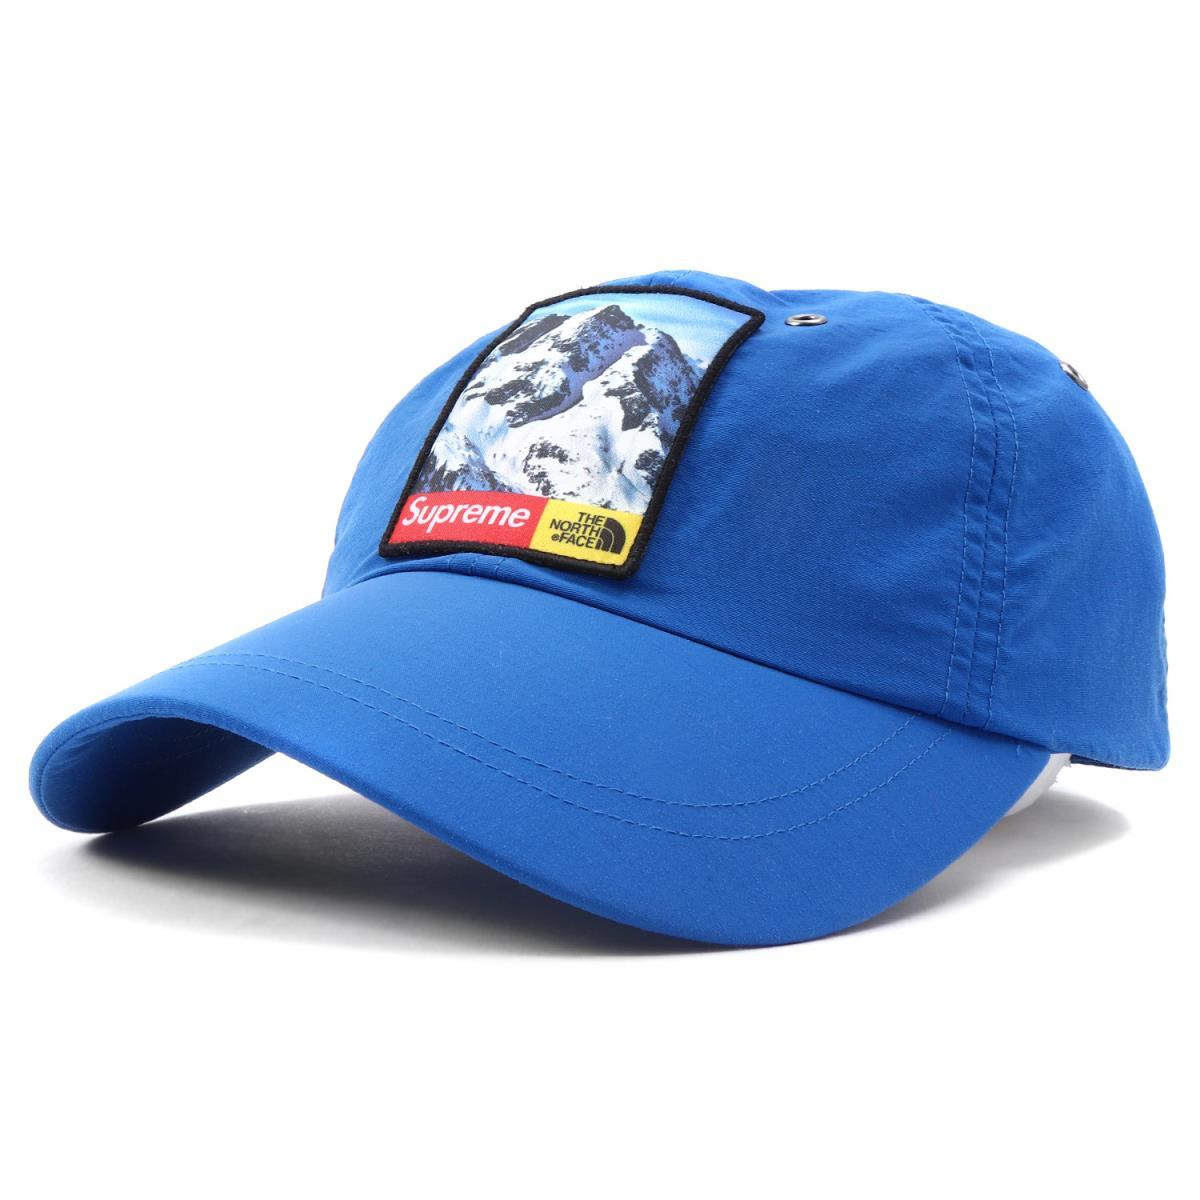 Supreme (シュプリーム) 17A/W ×THE NORTH FACE ワッペン付き6パネルキャップ(Mountain 6-Panel Hat) ロイヤル 【メンズ】【美品】【K2074】【中古】【あす楽☆対応可】